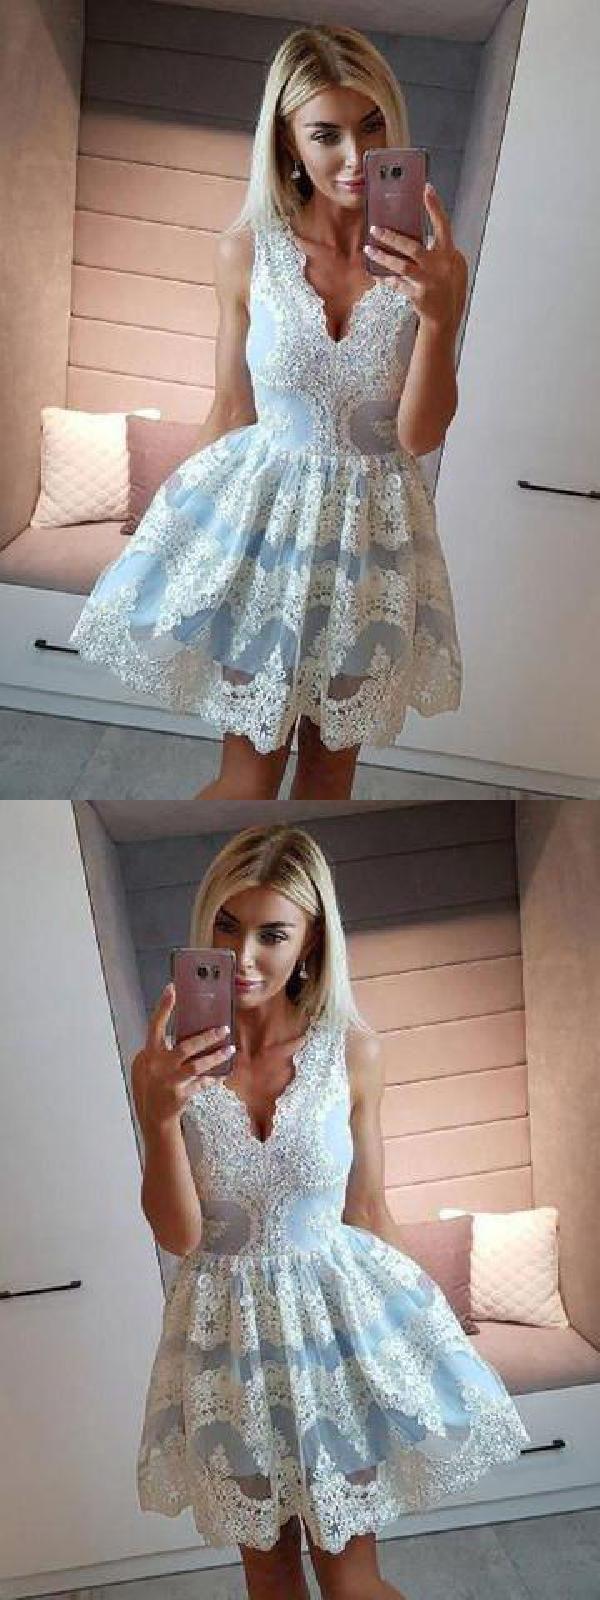 Homecoming dresses for cheap prom dresses short prom dresses